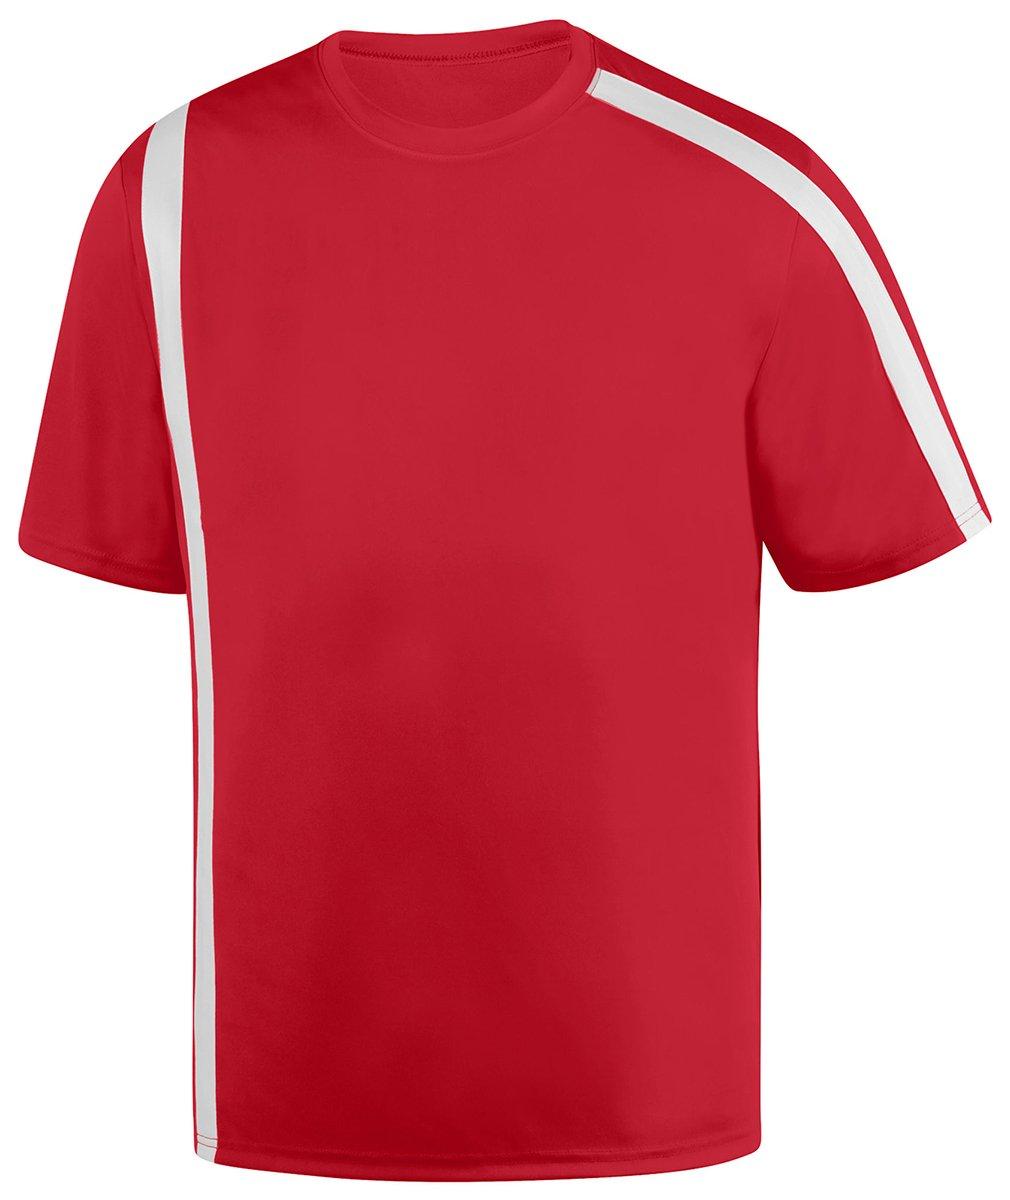 Augusta SportswearメンズAttacking Third Jersey B01DQ7EQQ2 Medium|レッド/ホワイト レッド/ホワイト Medium